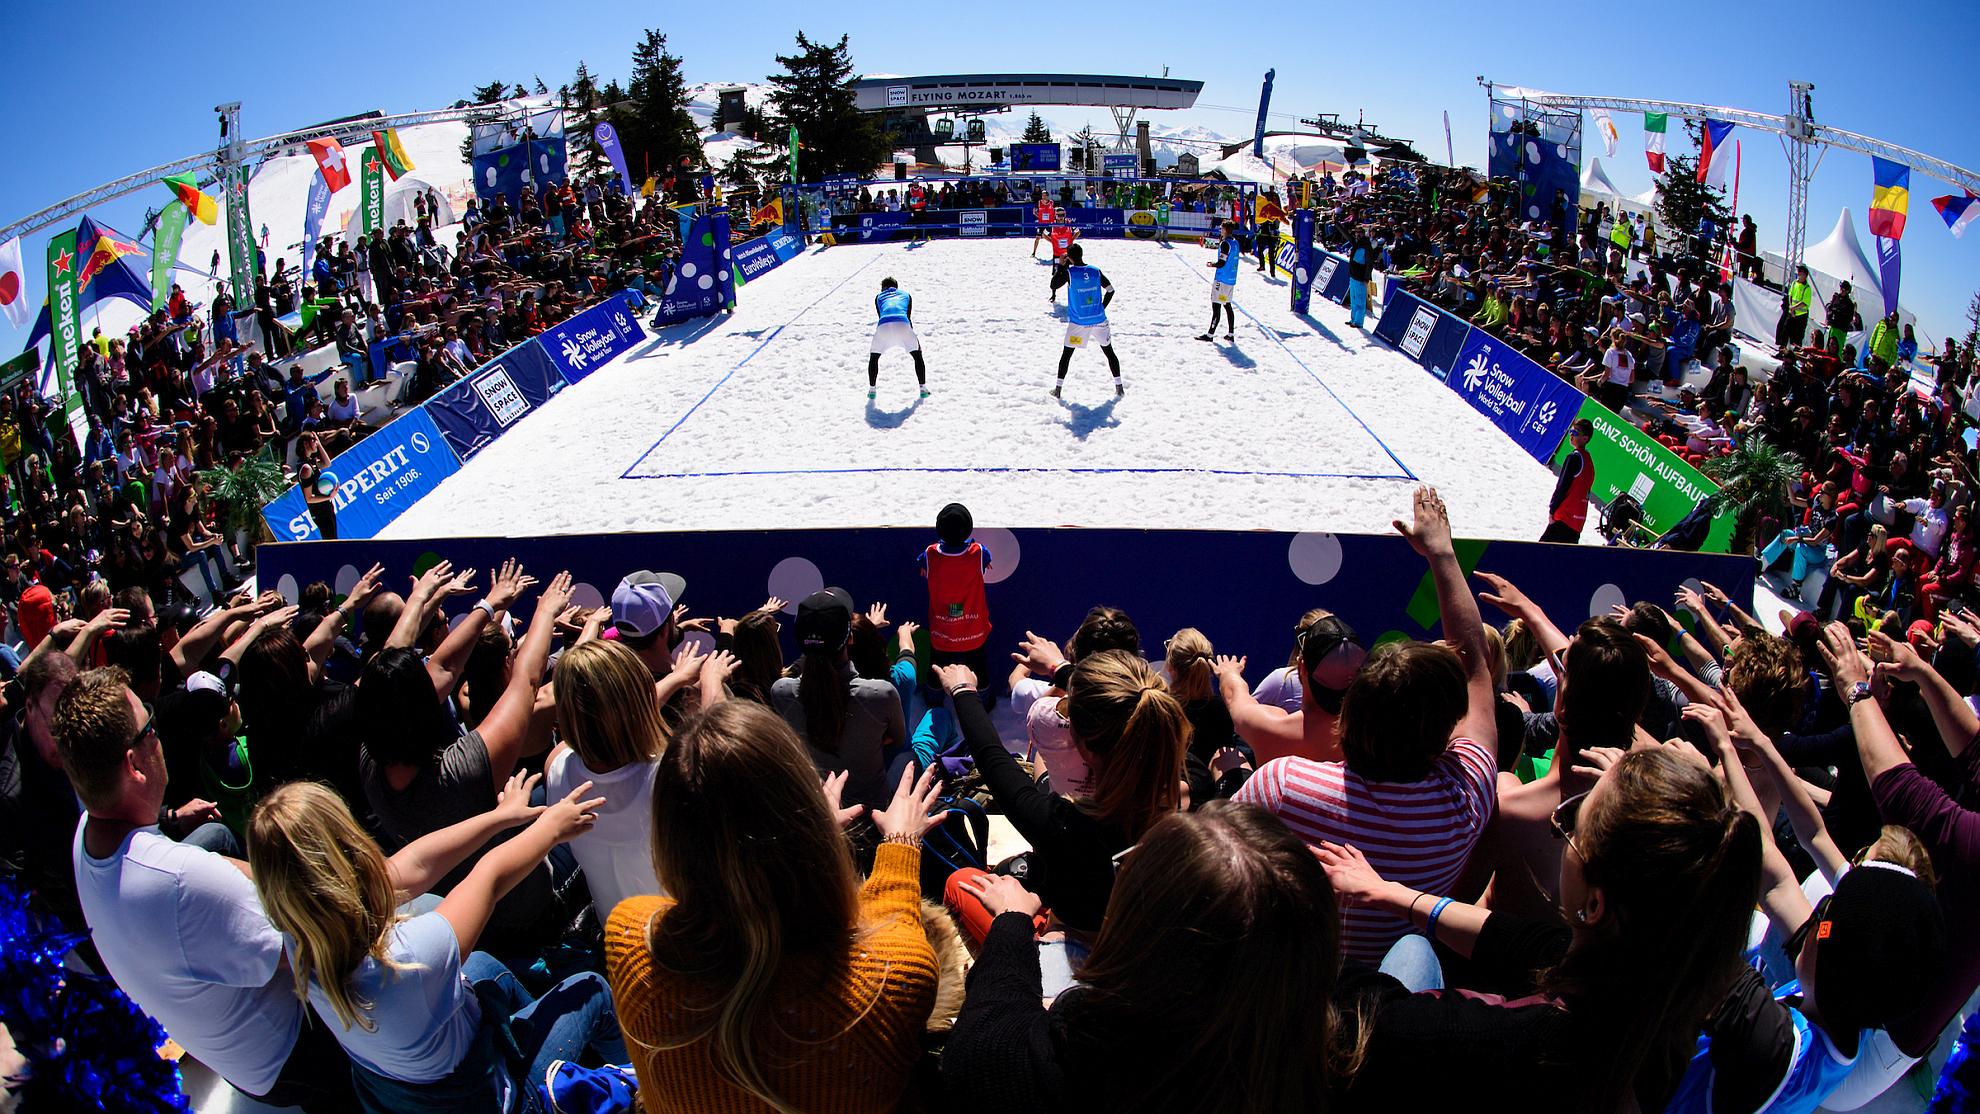 FIVB Snow Volleyball World Tour Wagrain-Kleinarl 2019 © Conny Kurth/Chaka2